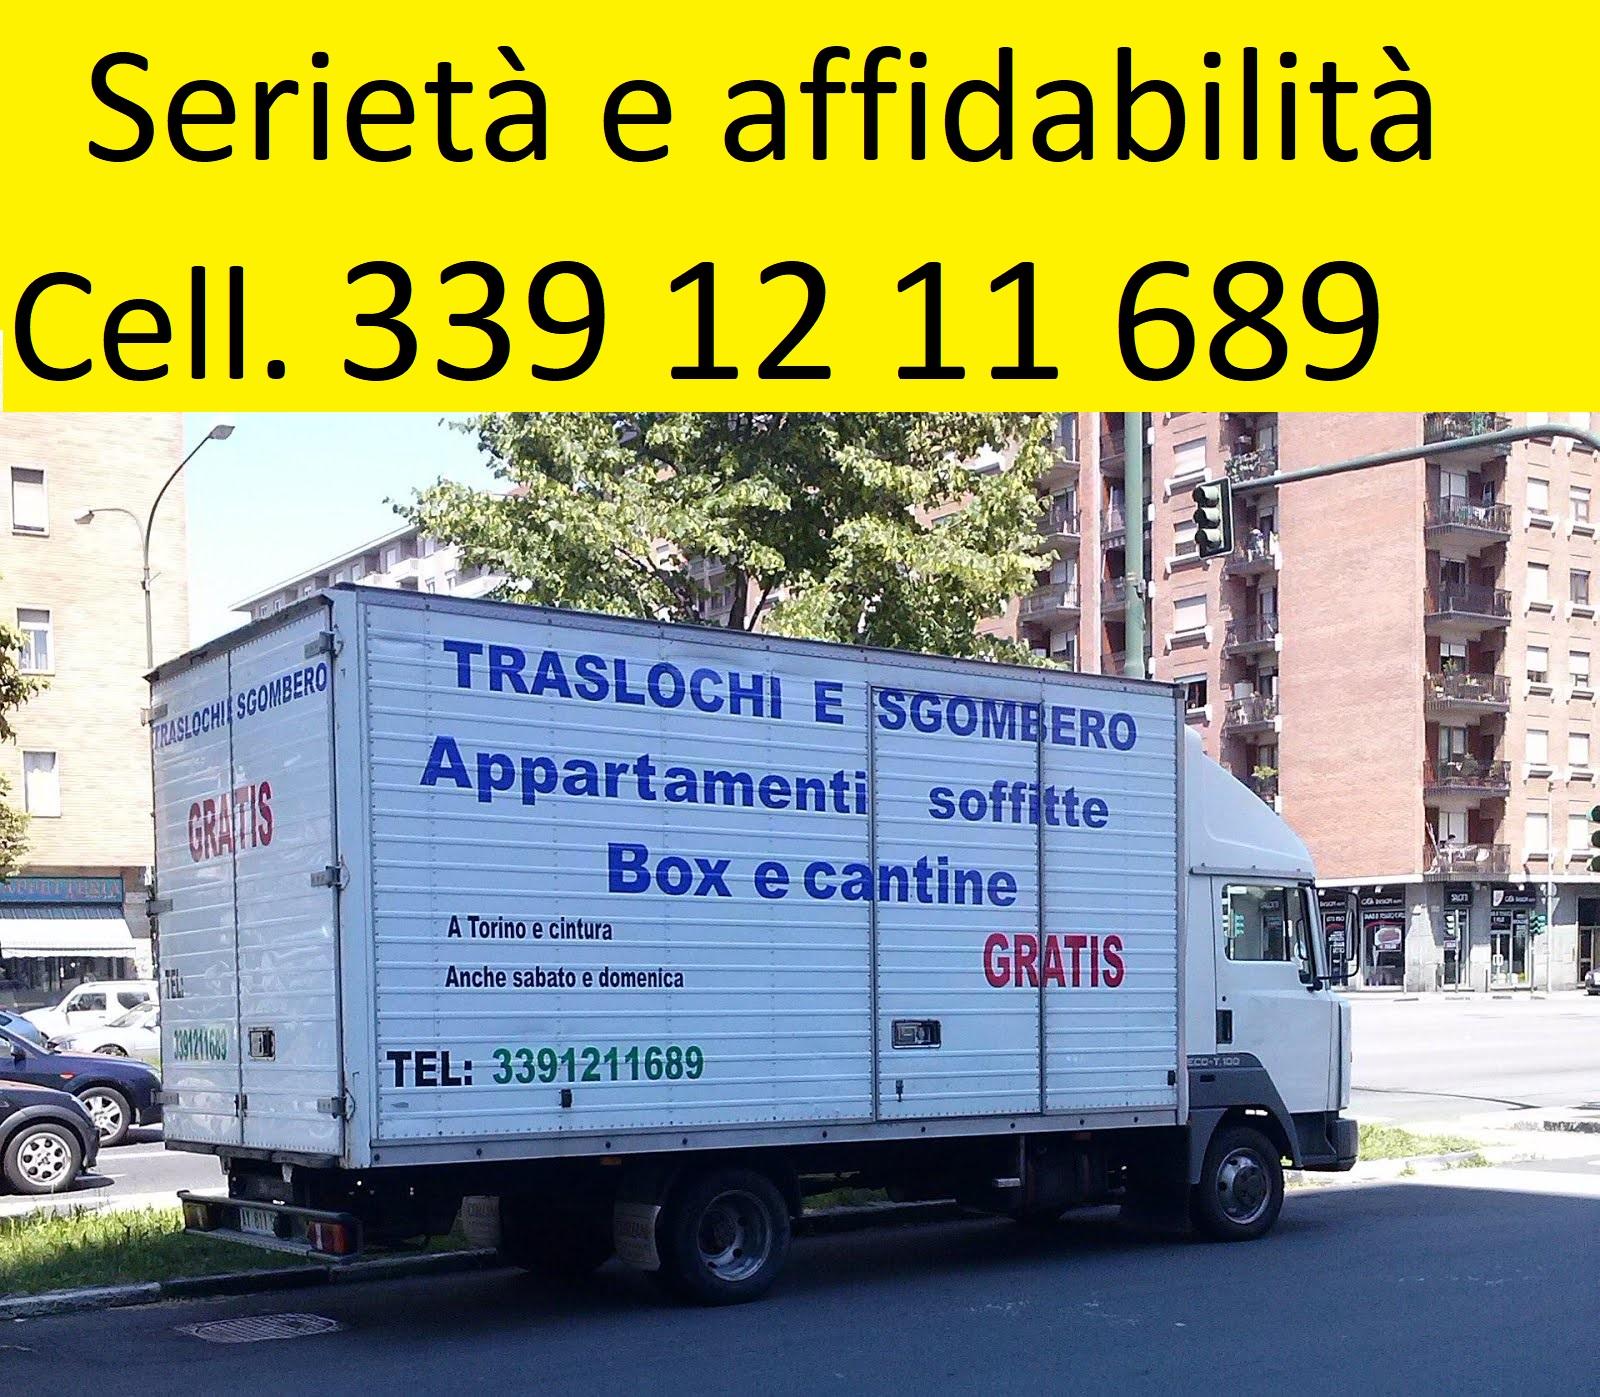 Mobili Usati Gratis Milano.Ritiro Mobili Usati Torino